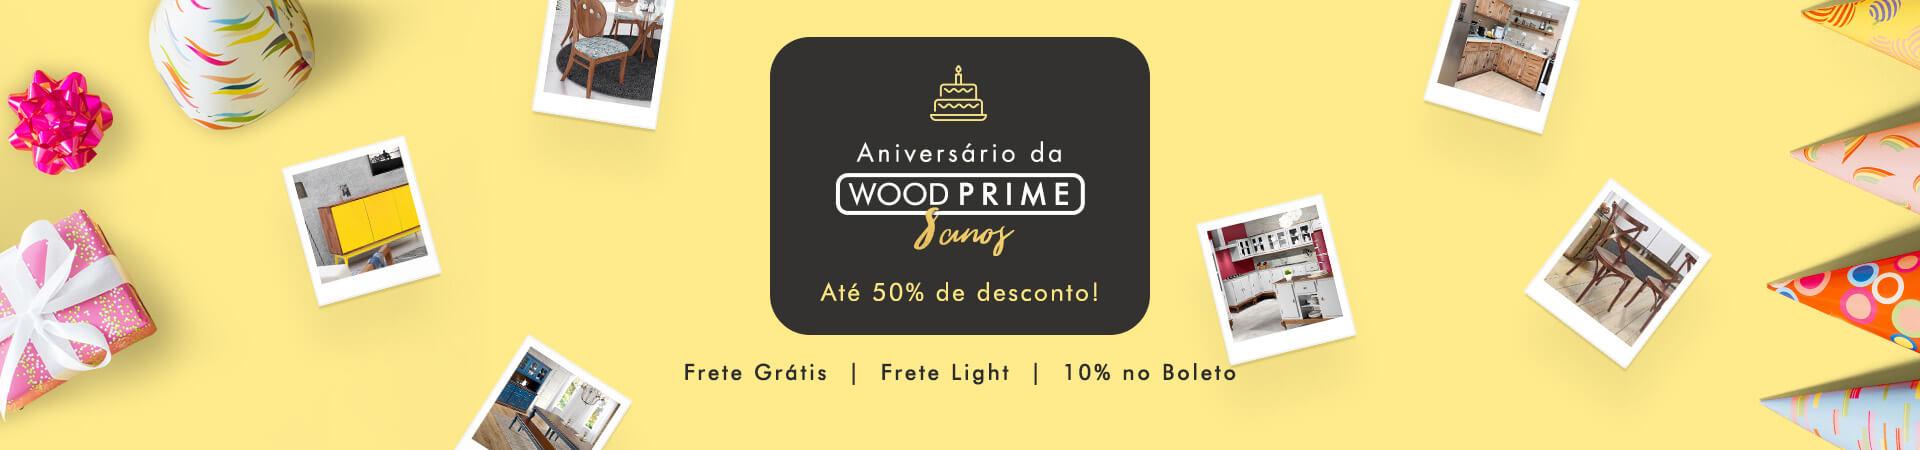 wood-prime-aniversario